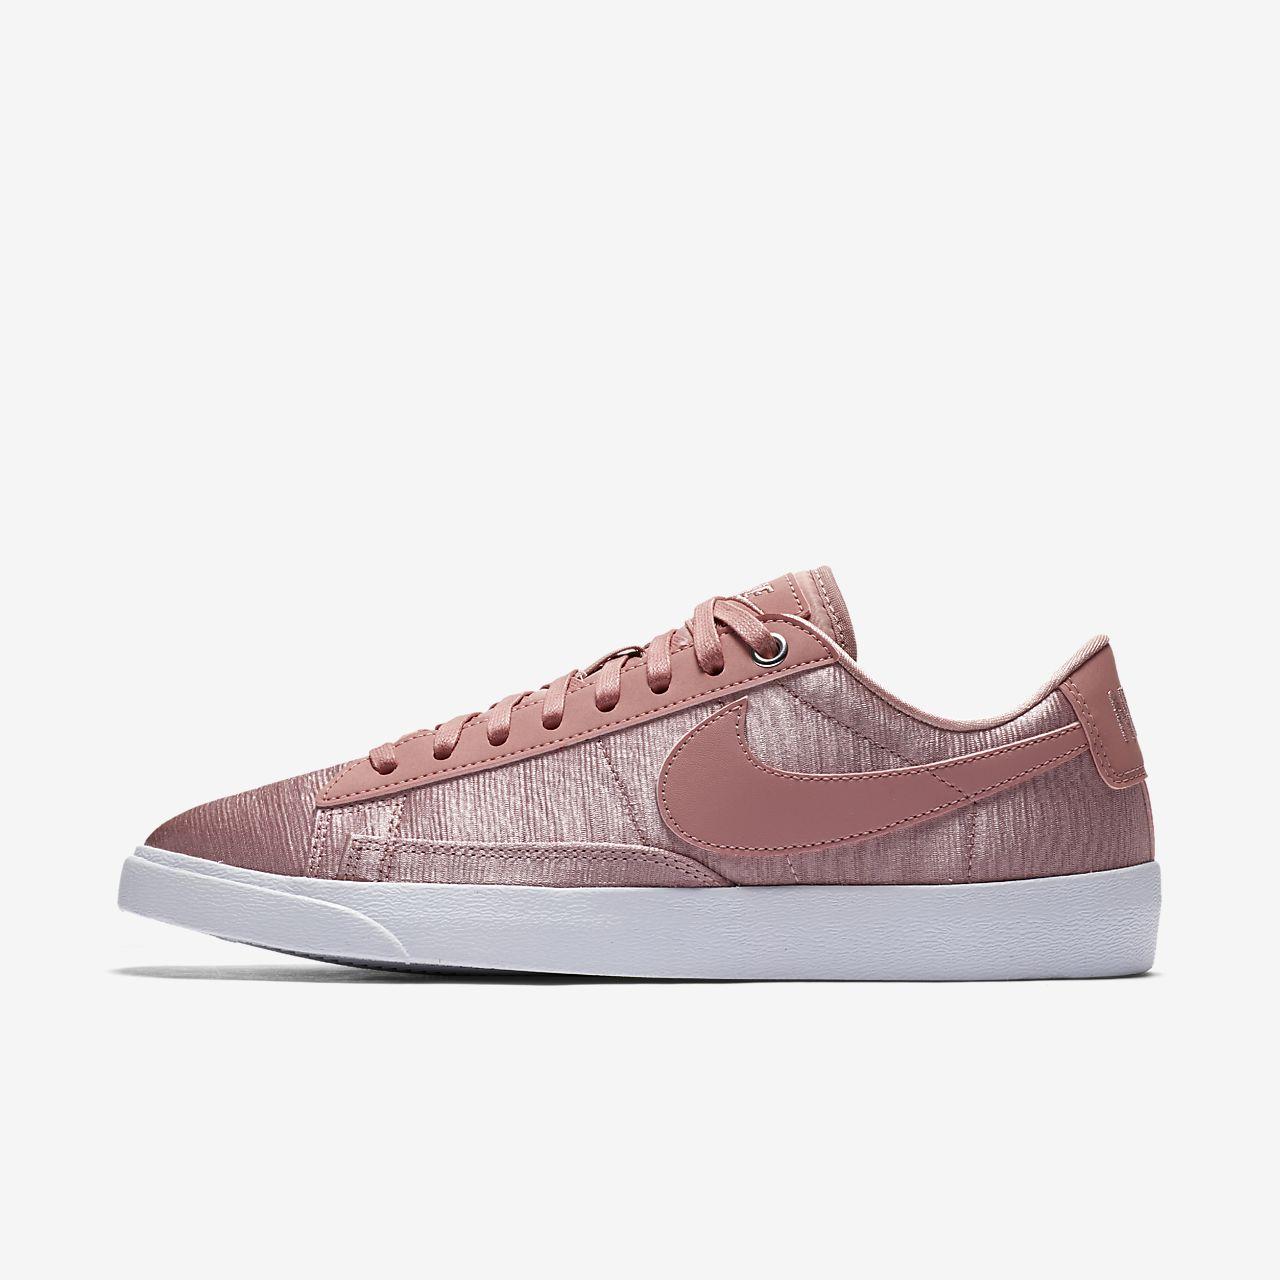 Verde Sb Mujeres Cc7a5 Nike Low Ea281 Blazer Shopping Xn0Ok8wP